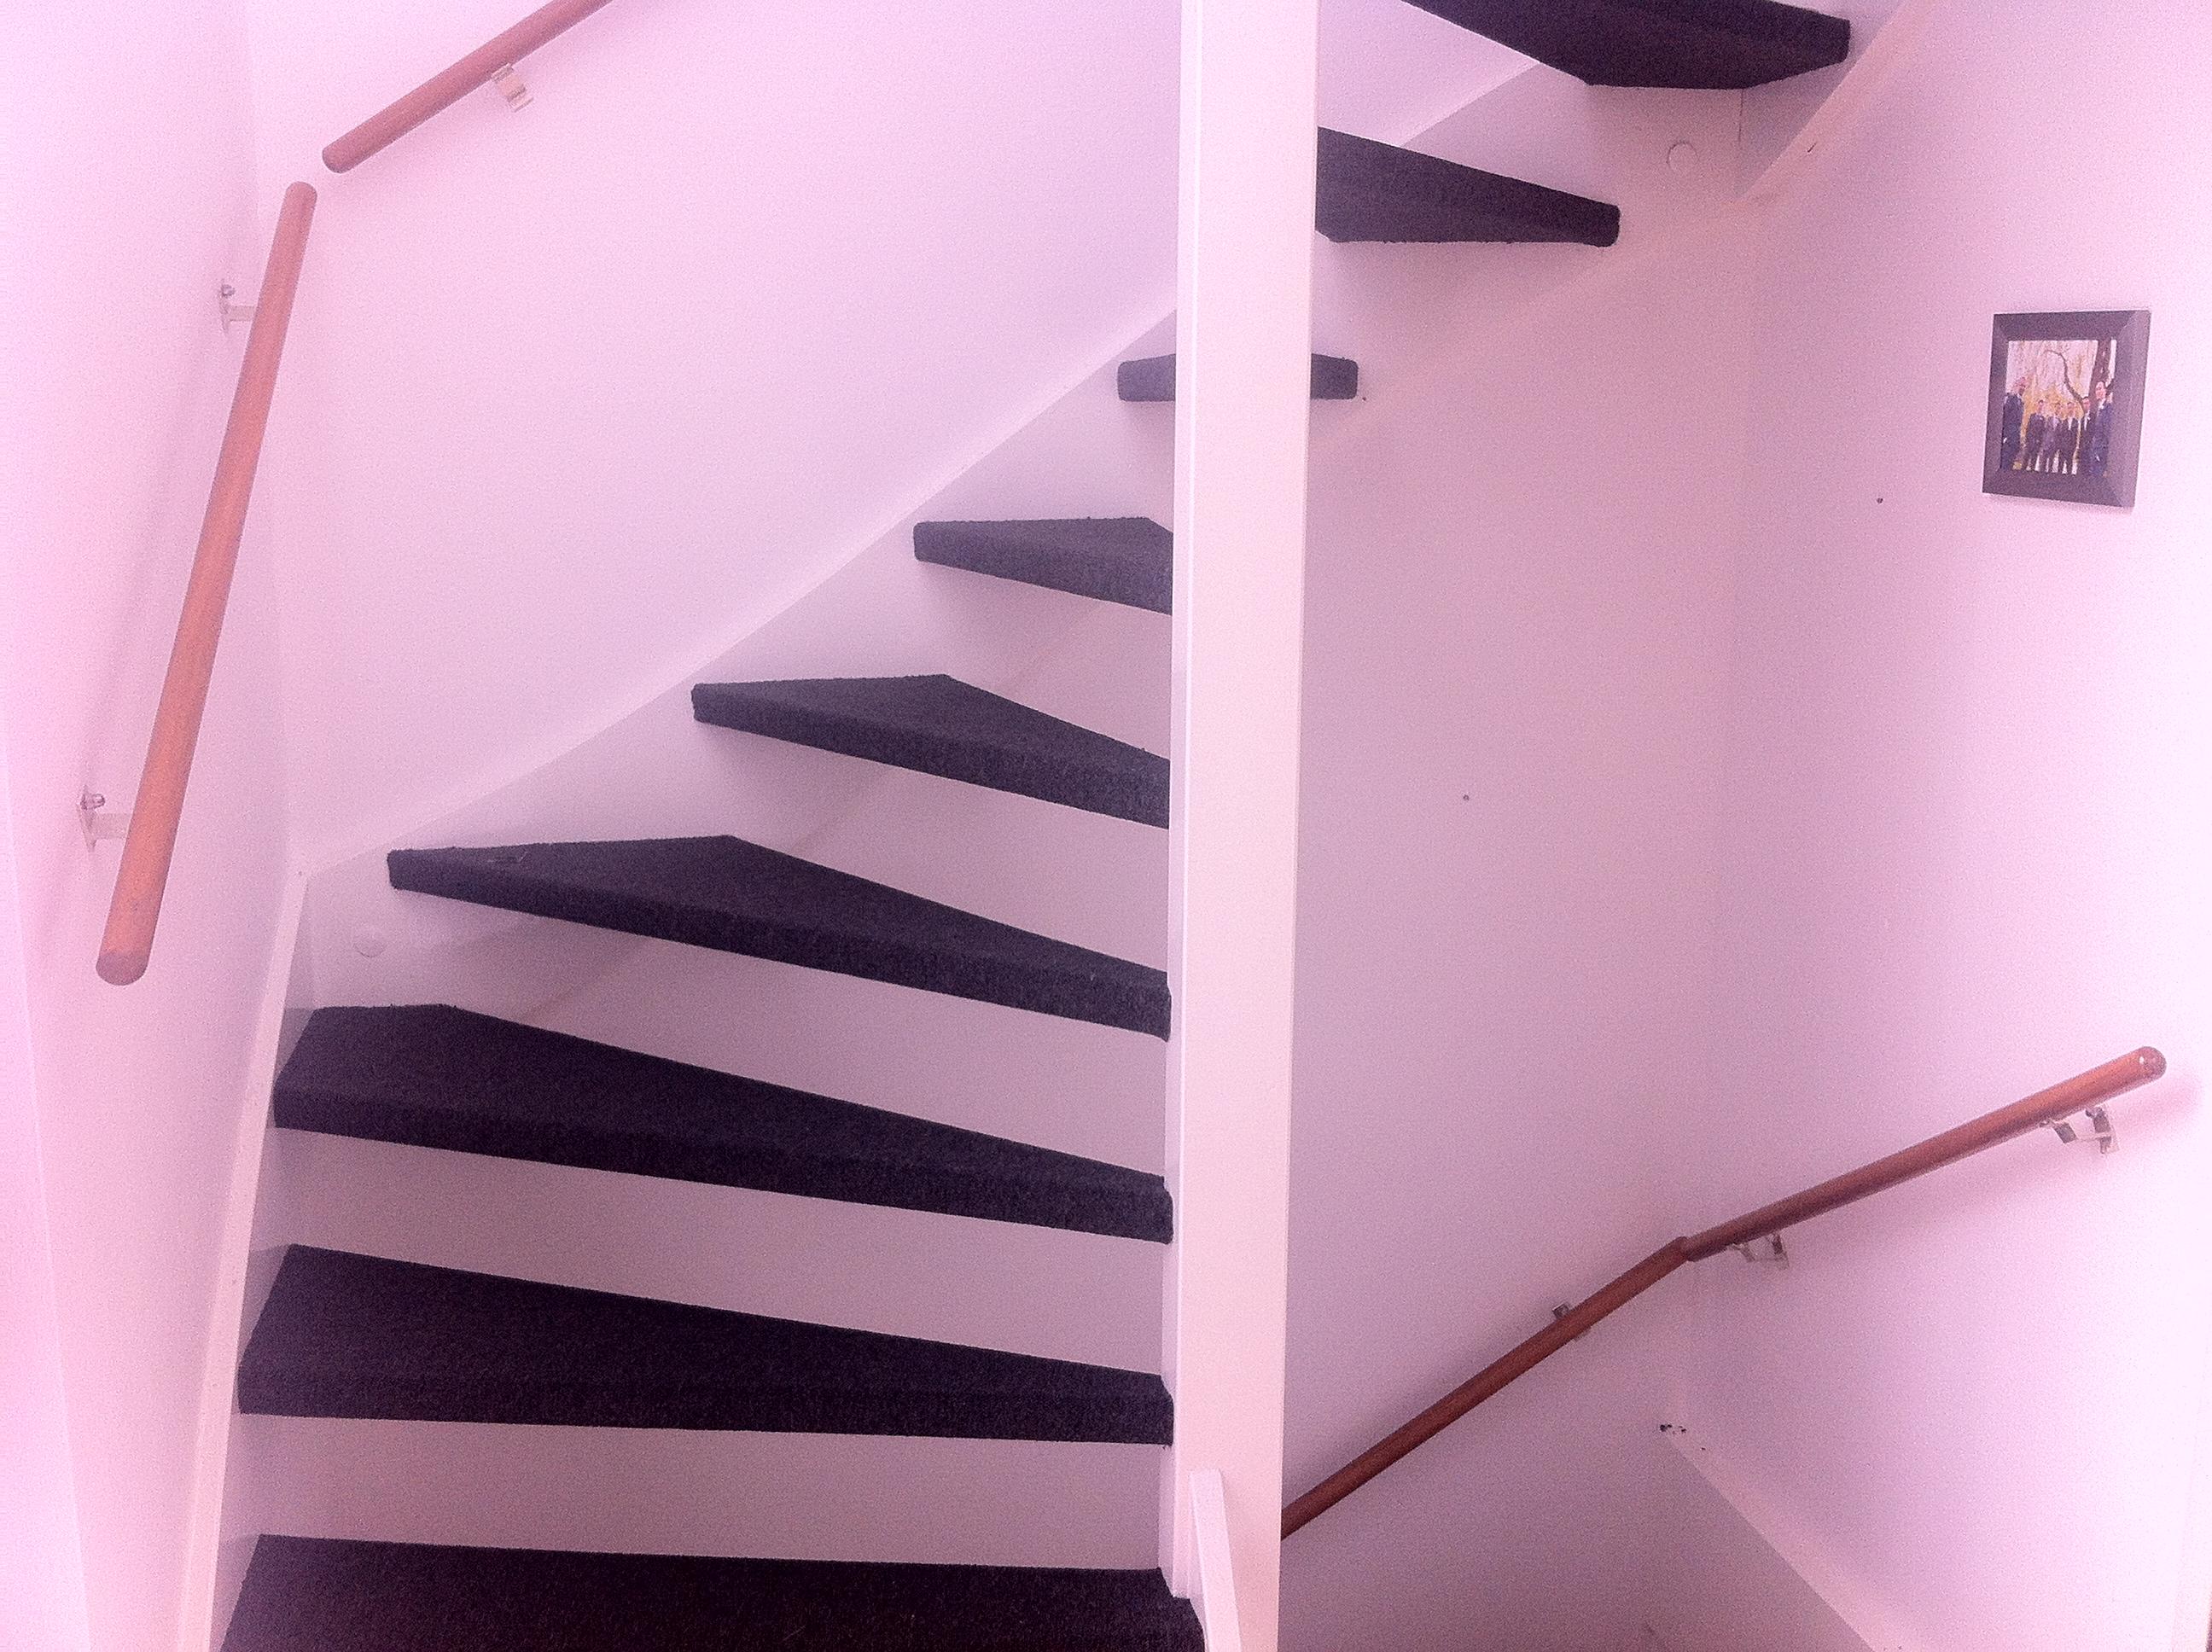 Bekend Open trap bekleden - MijnTrapBekleden.nl RK53